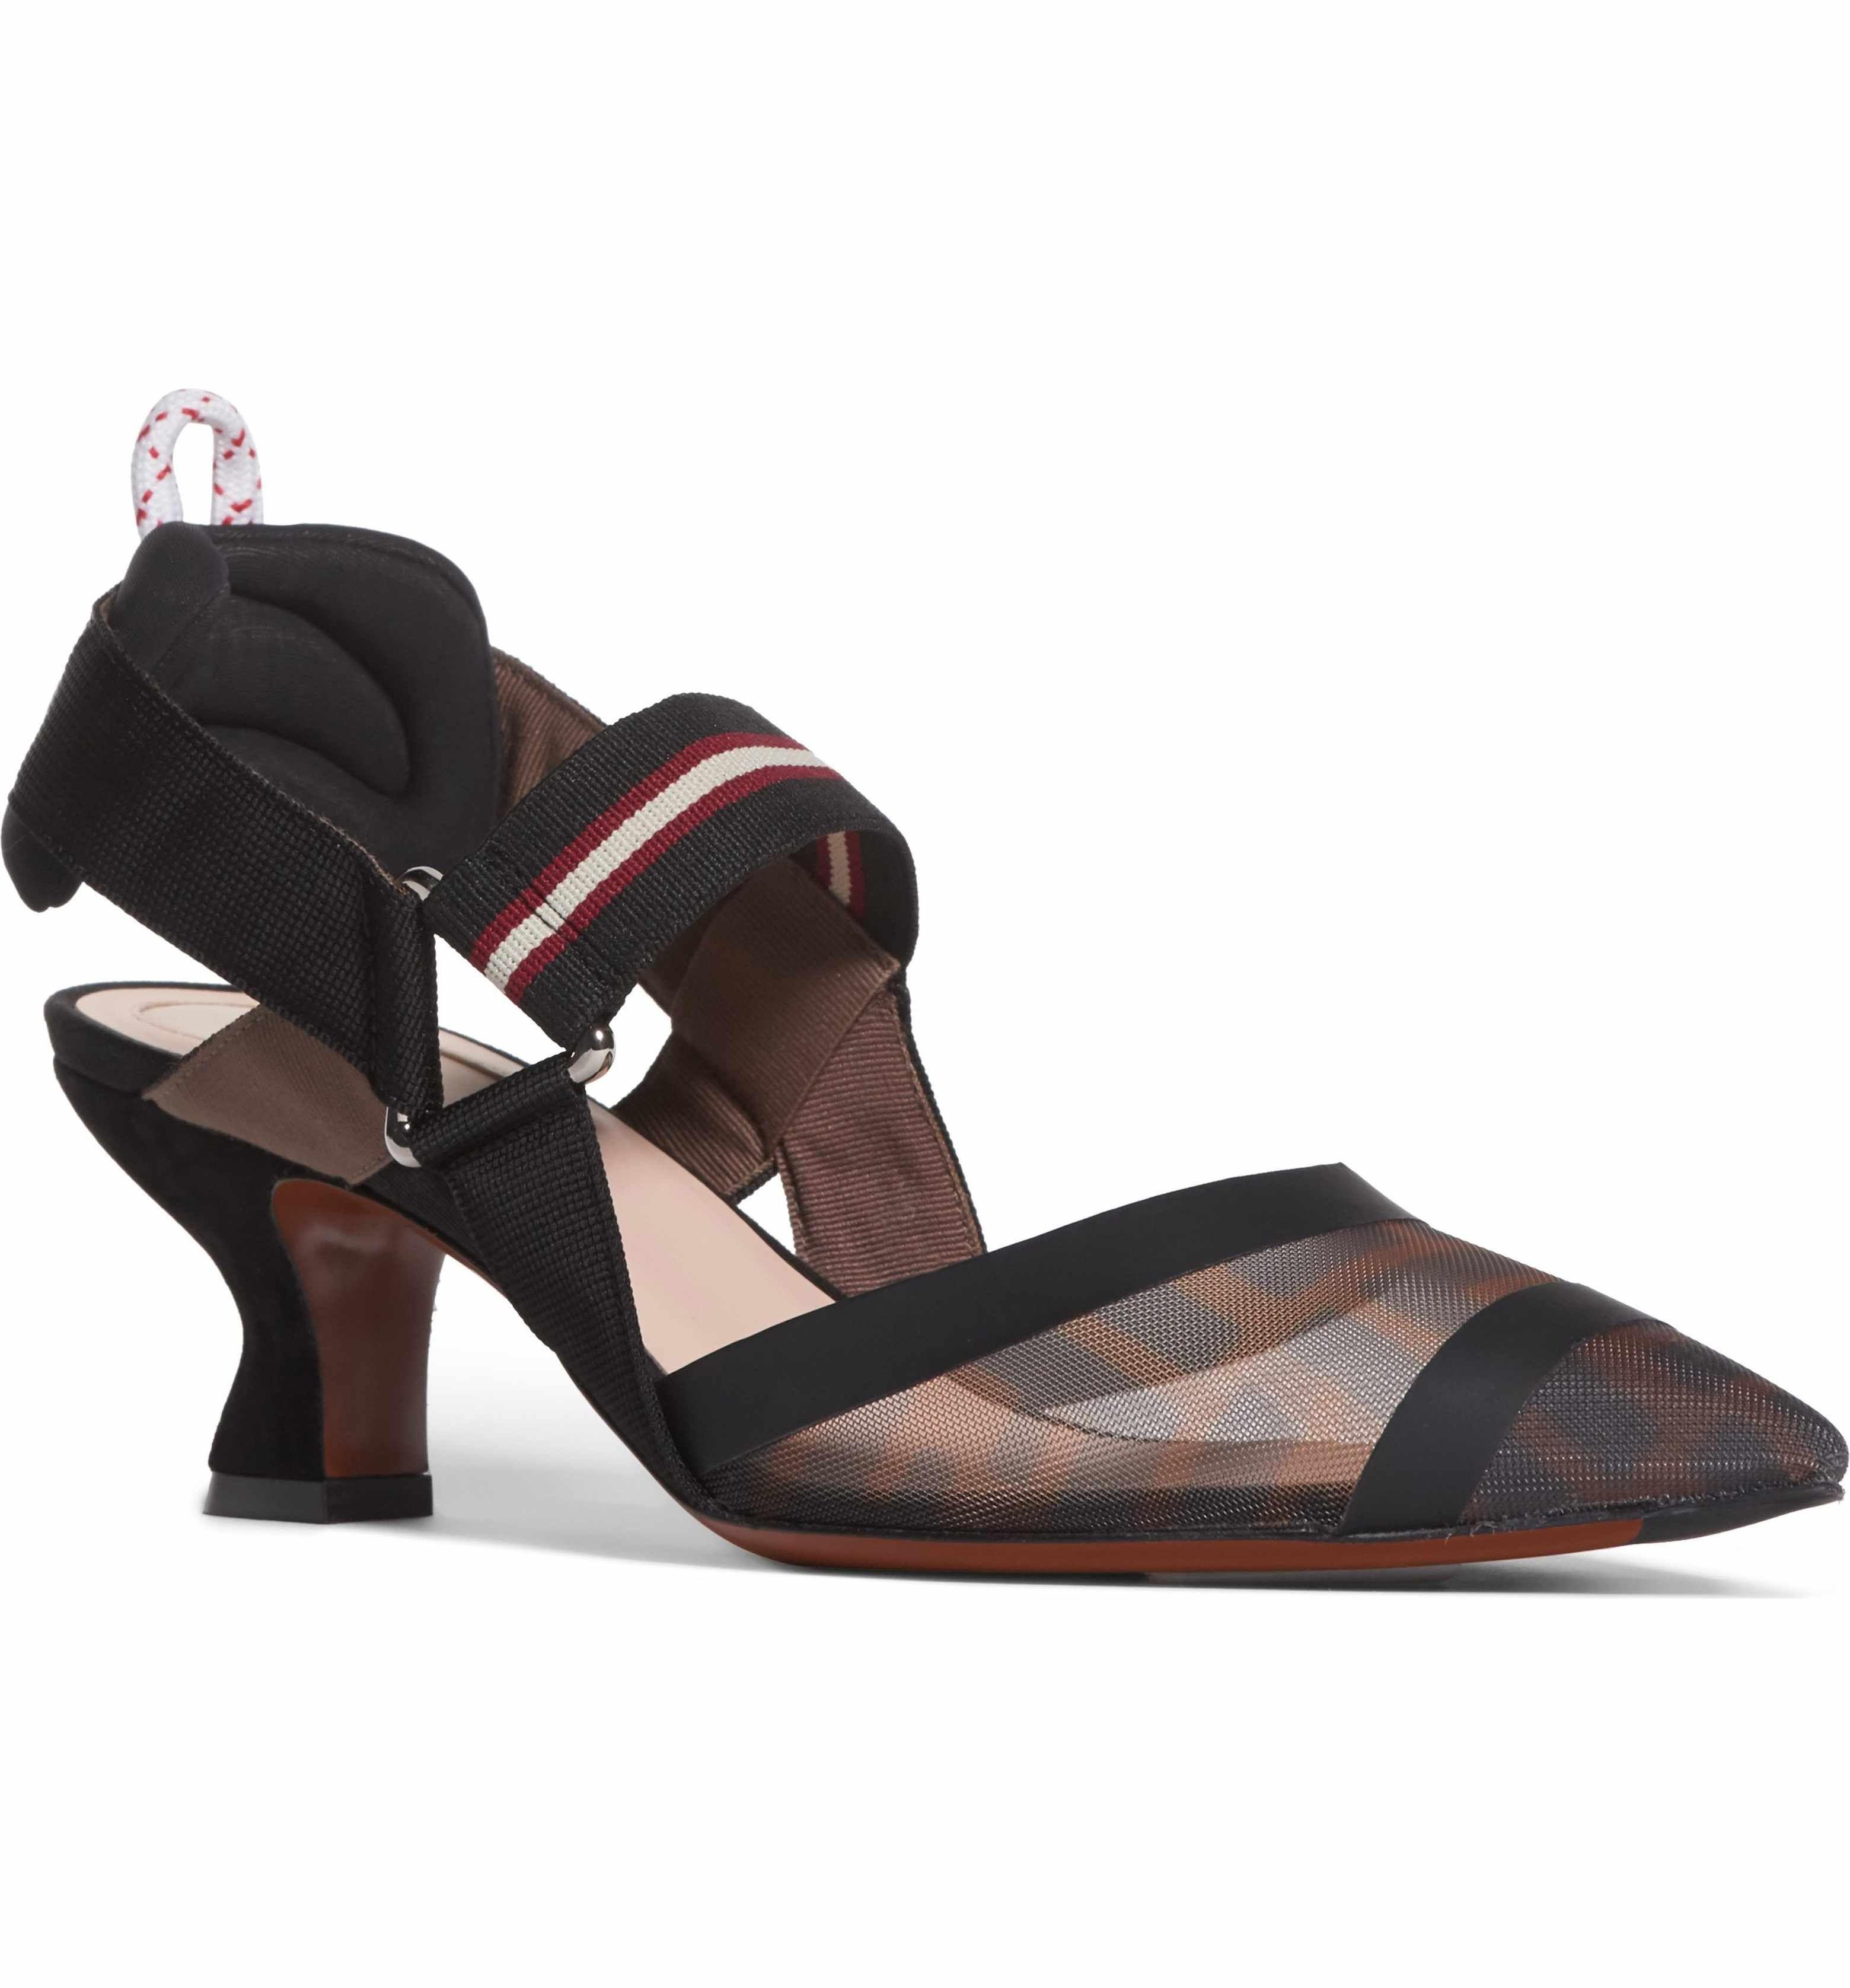 Fendi Women's Pointy Toe Pump Q5w7zn